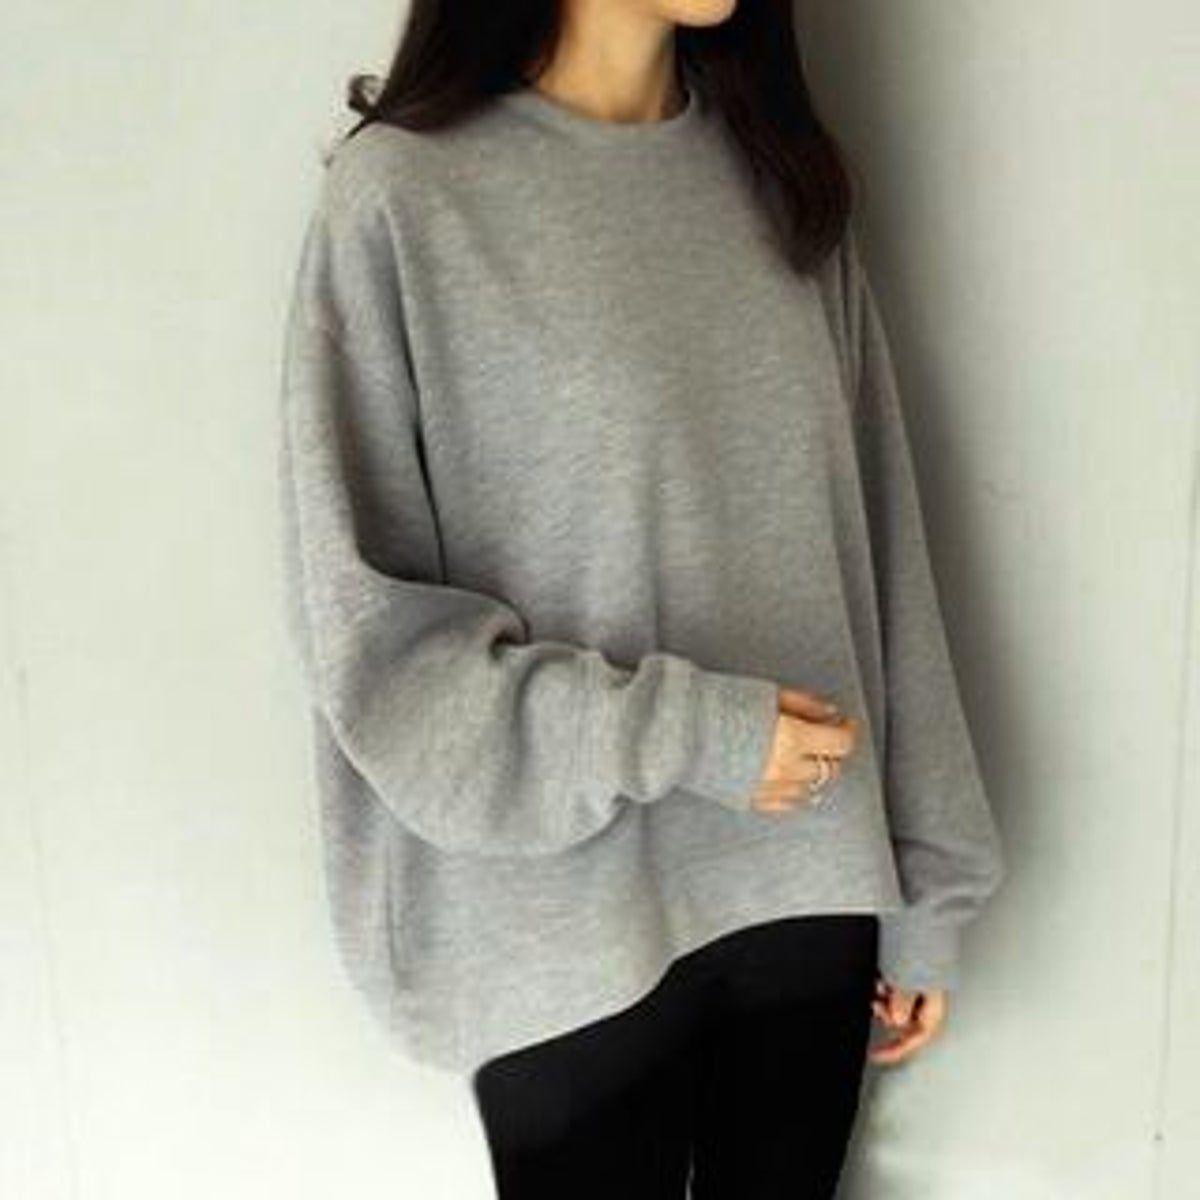 Girl wearing an oversized grey sweatshirt with black leggings.